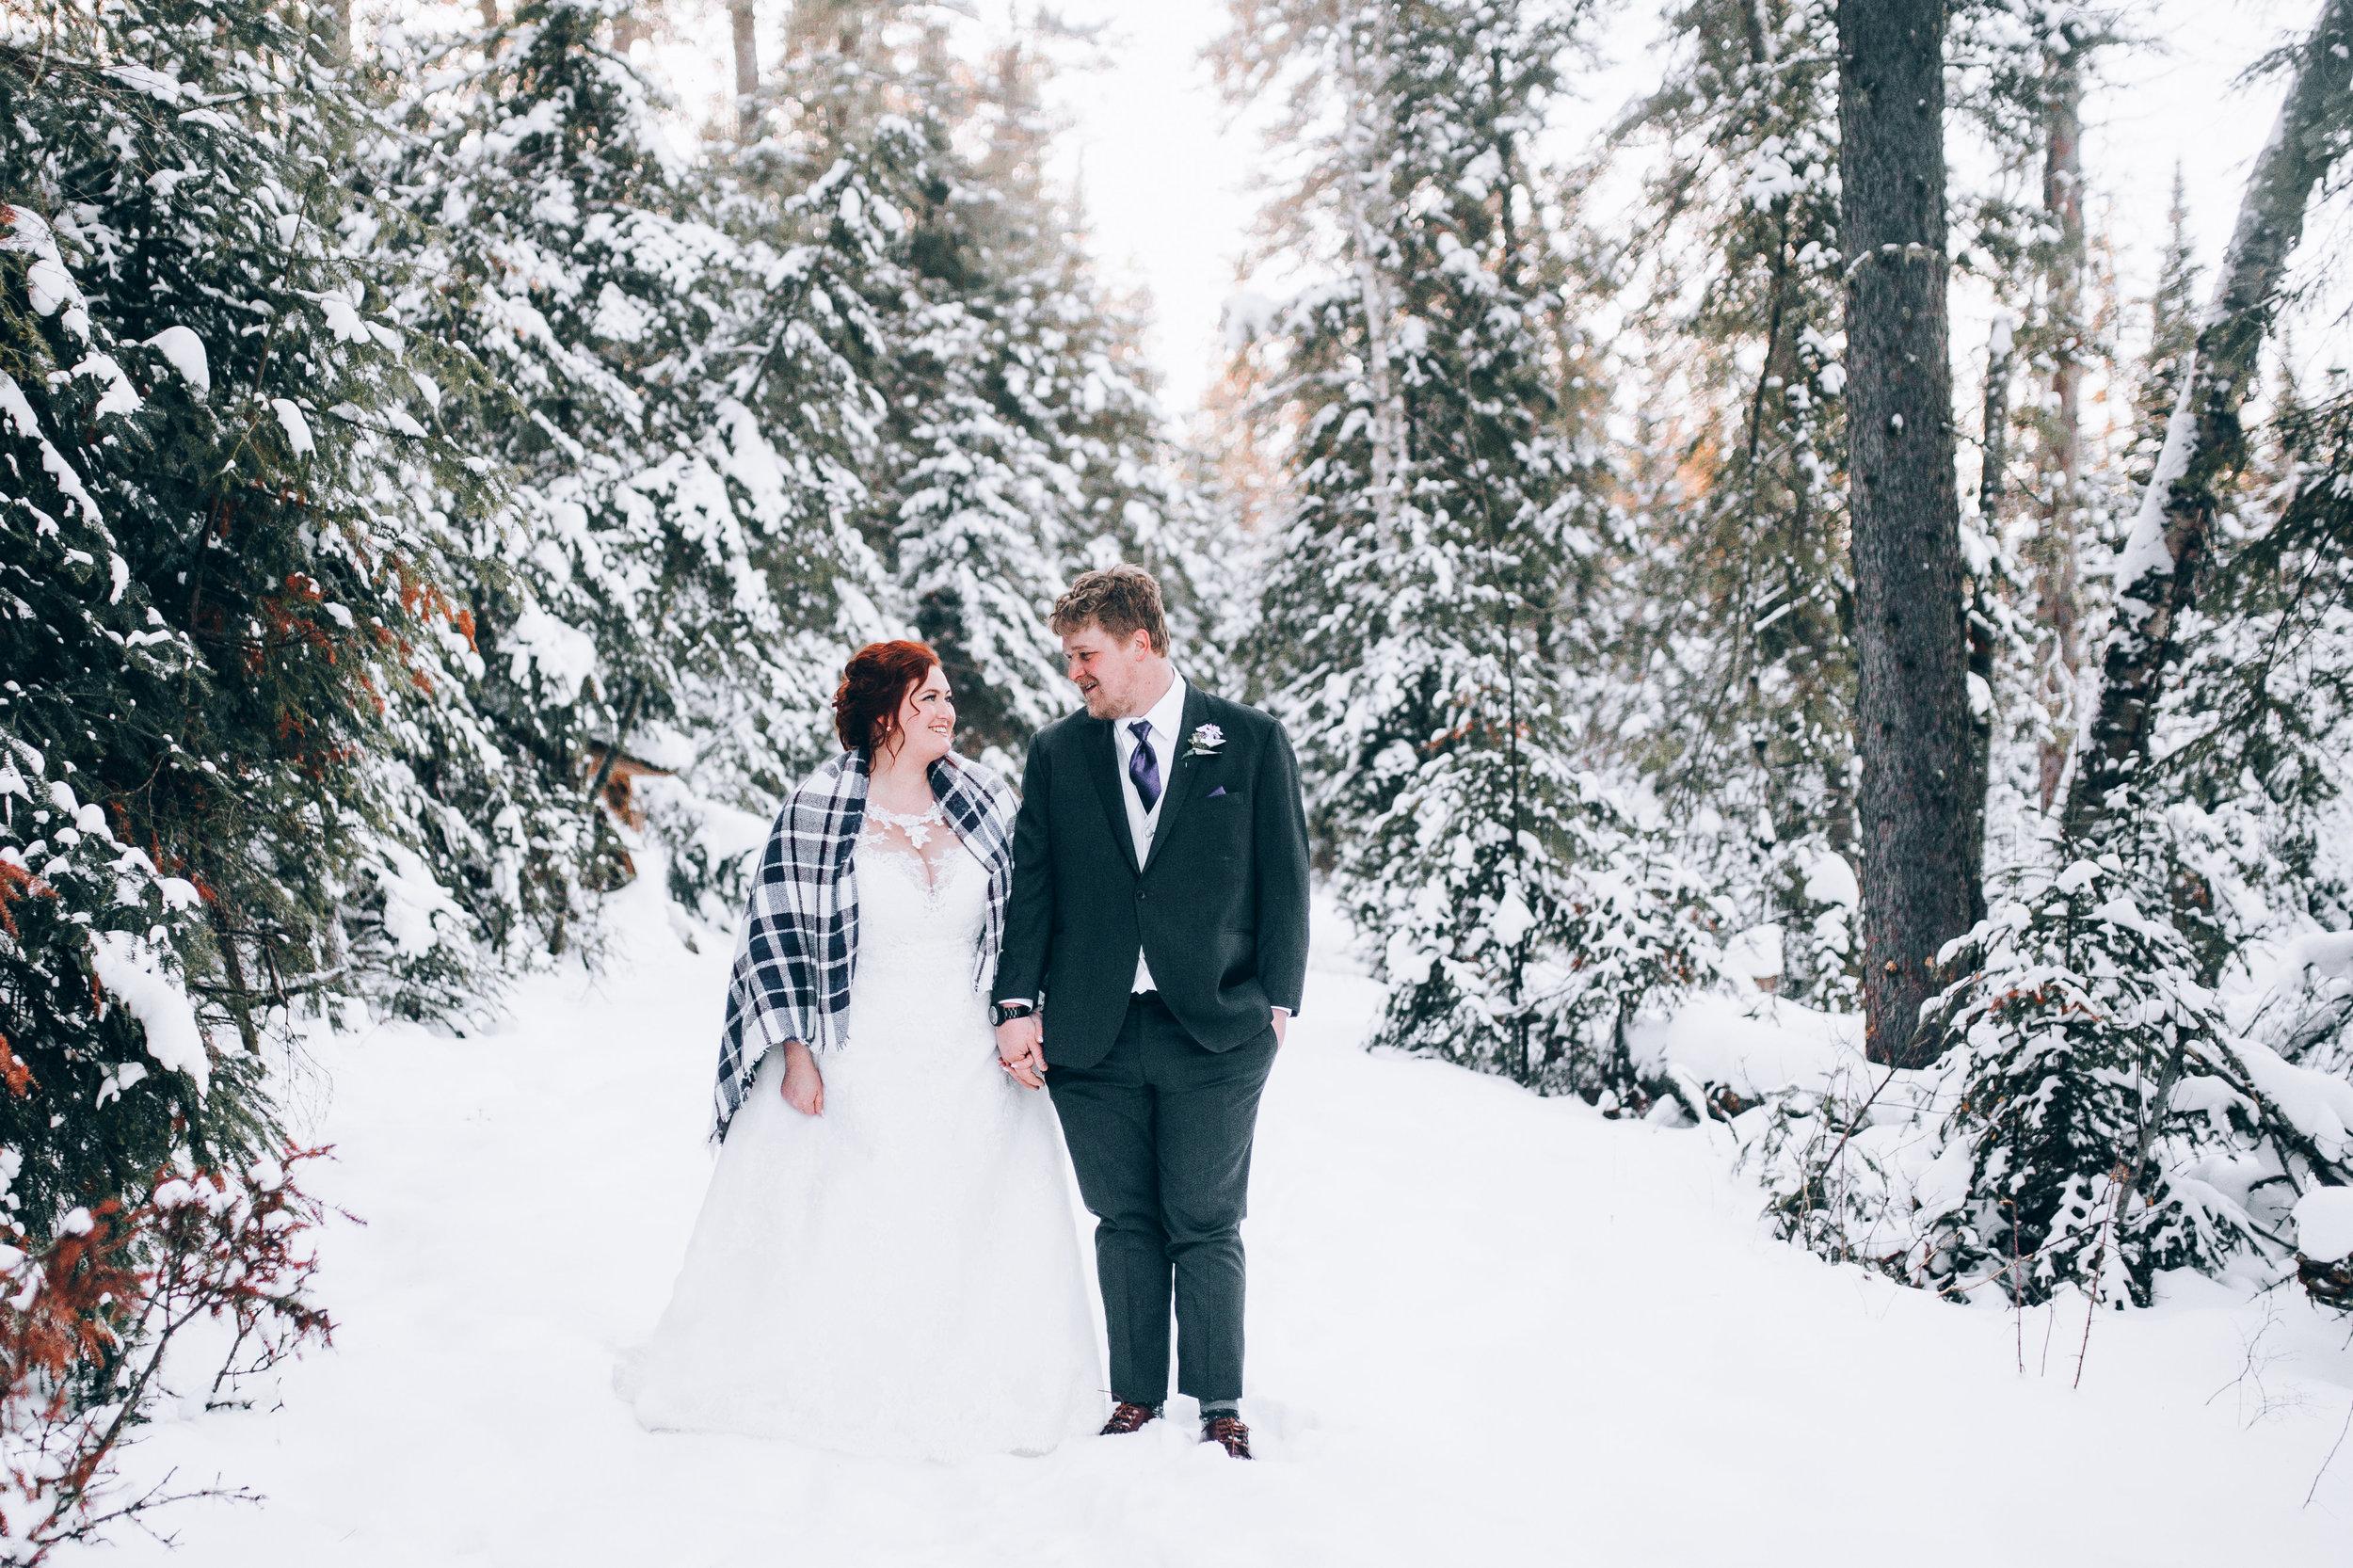 Hosmann Wedding Day-done 2-0009.jpg